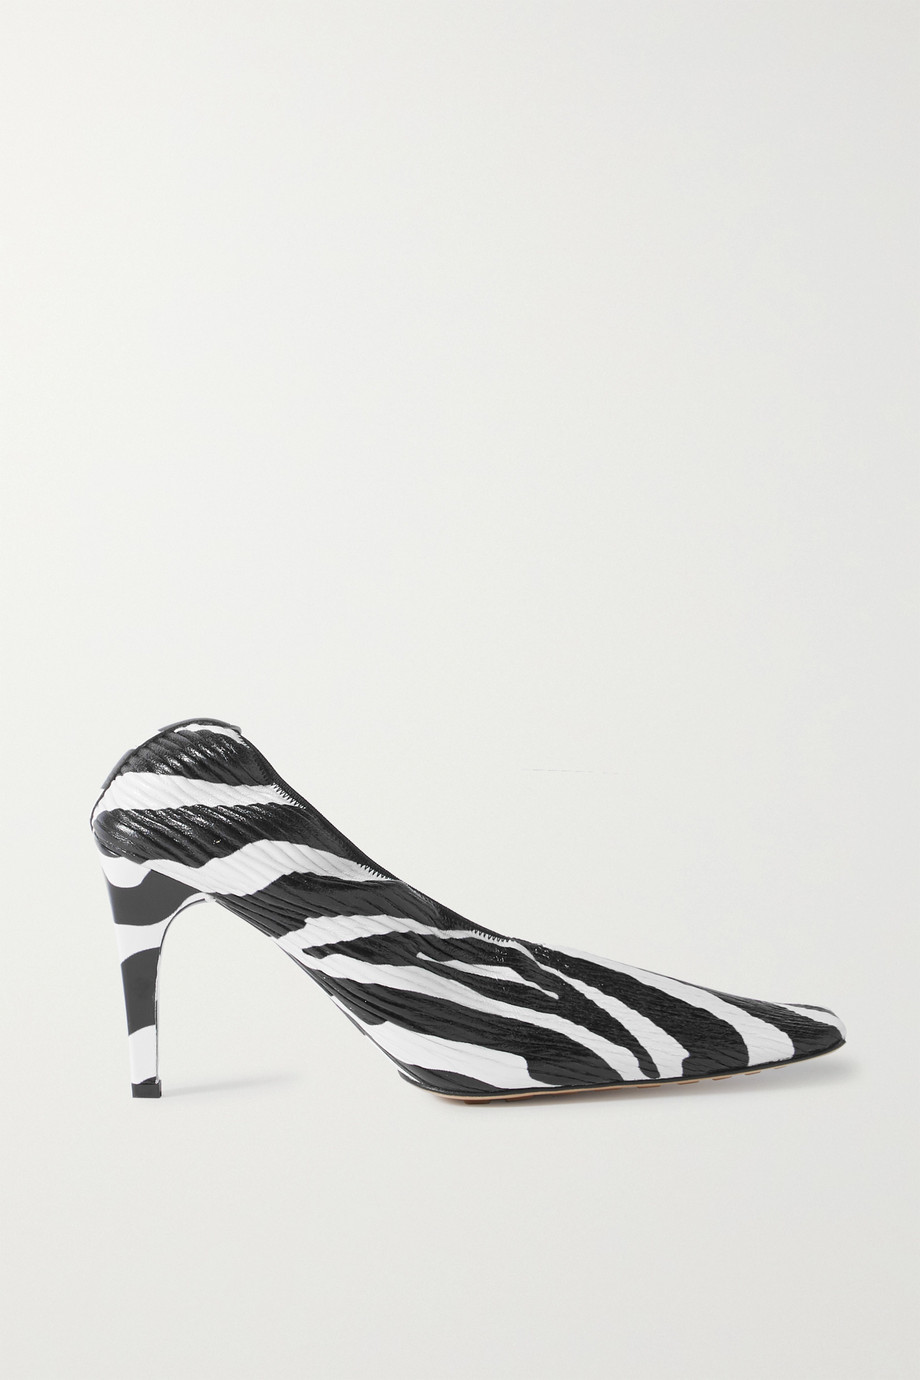 Bottega Veneta Zebra-print textured-leather pumps